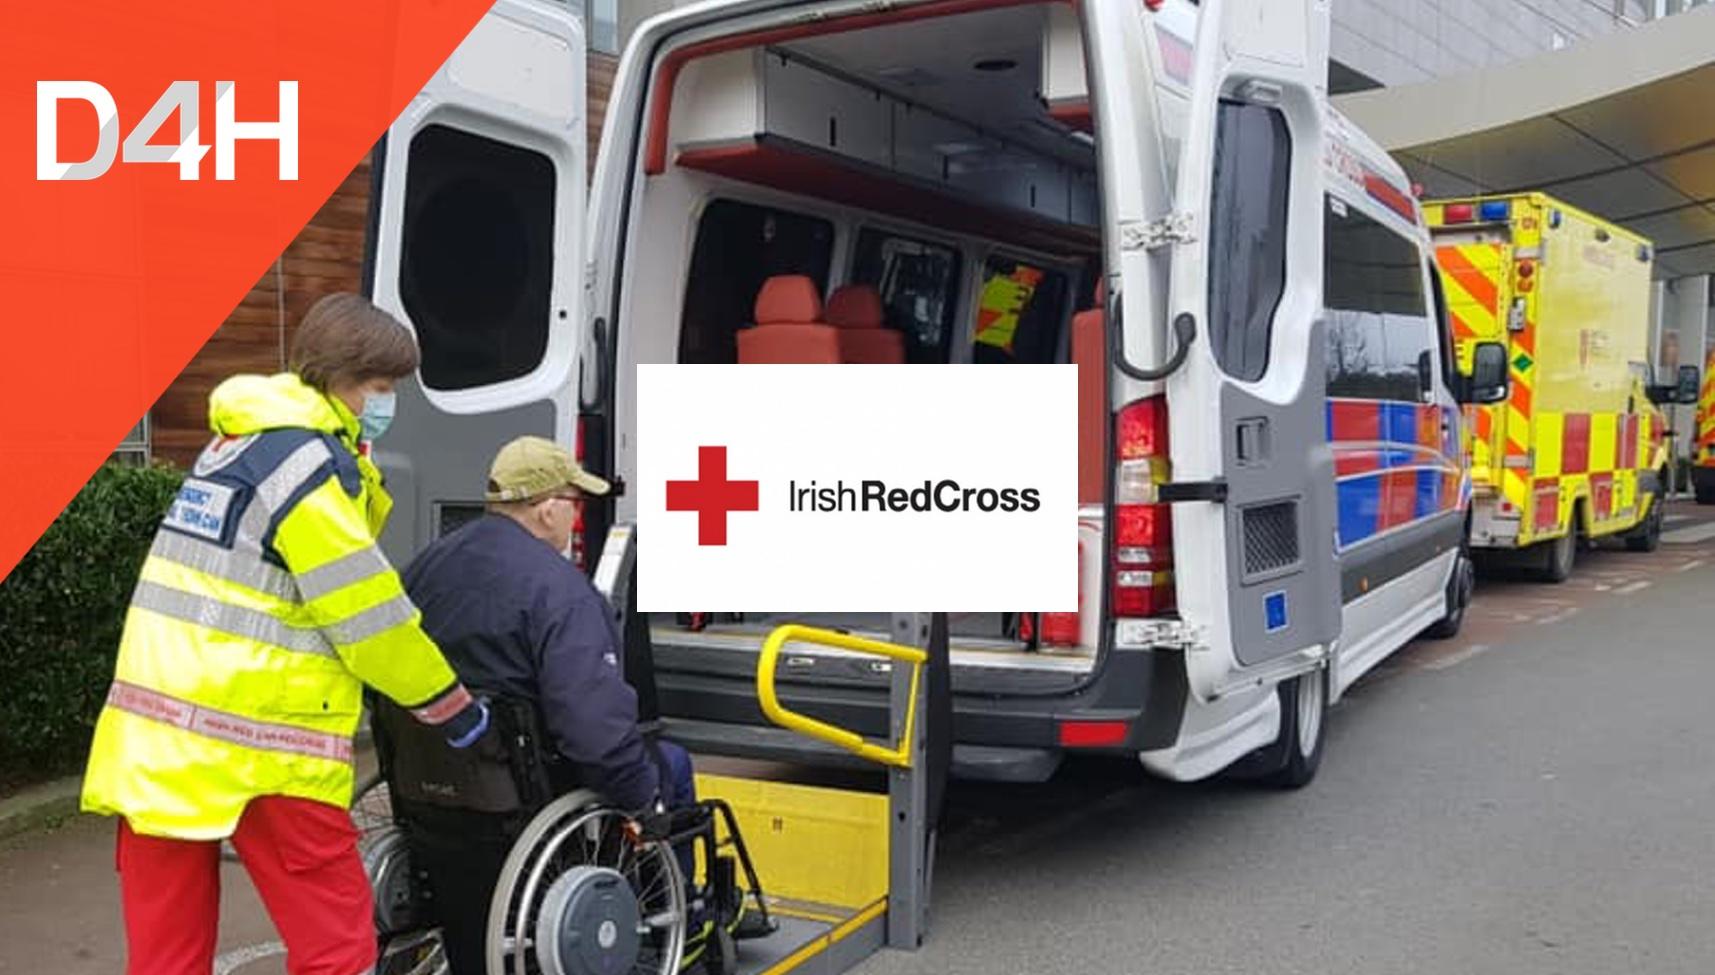 Irish Red Cross Case Study